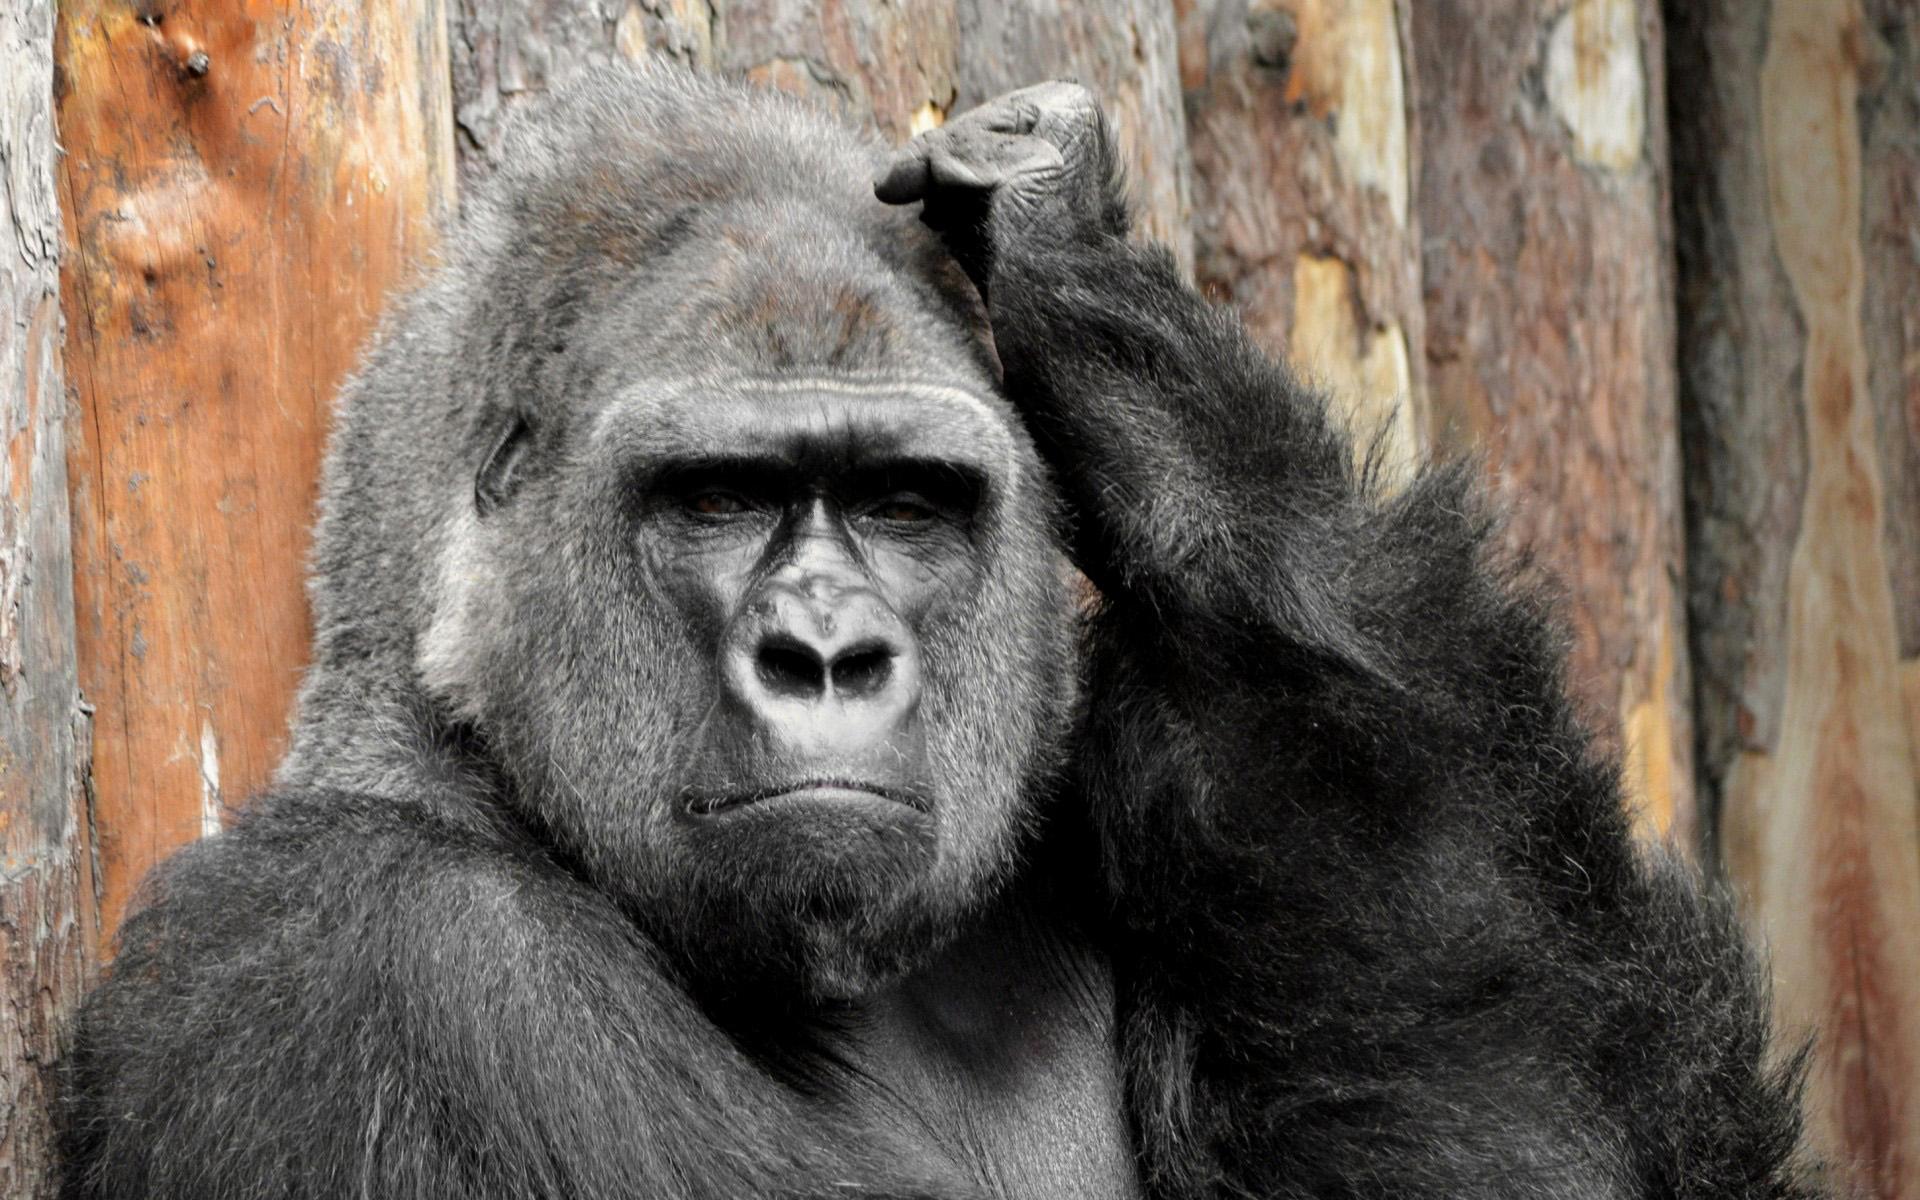 free gorilla wallpapers, gorilla pics